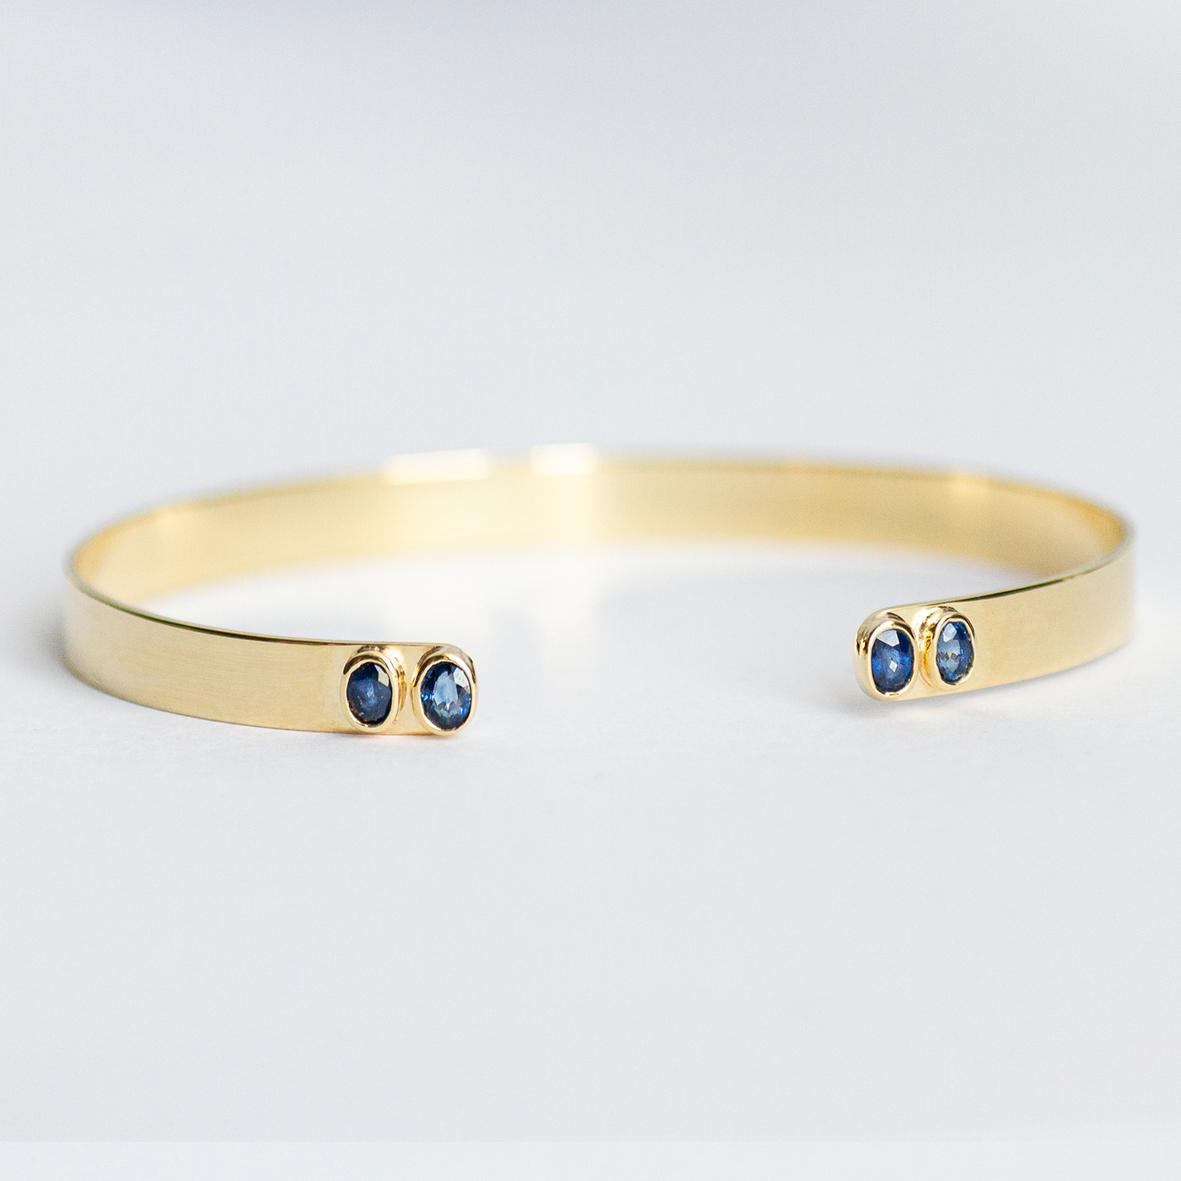 1. OONA_lotus_ficha1_blue sapphire bracelet